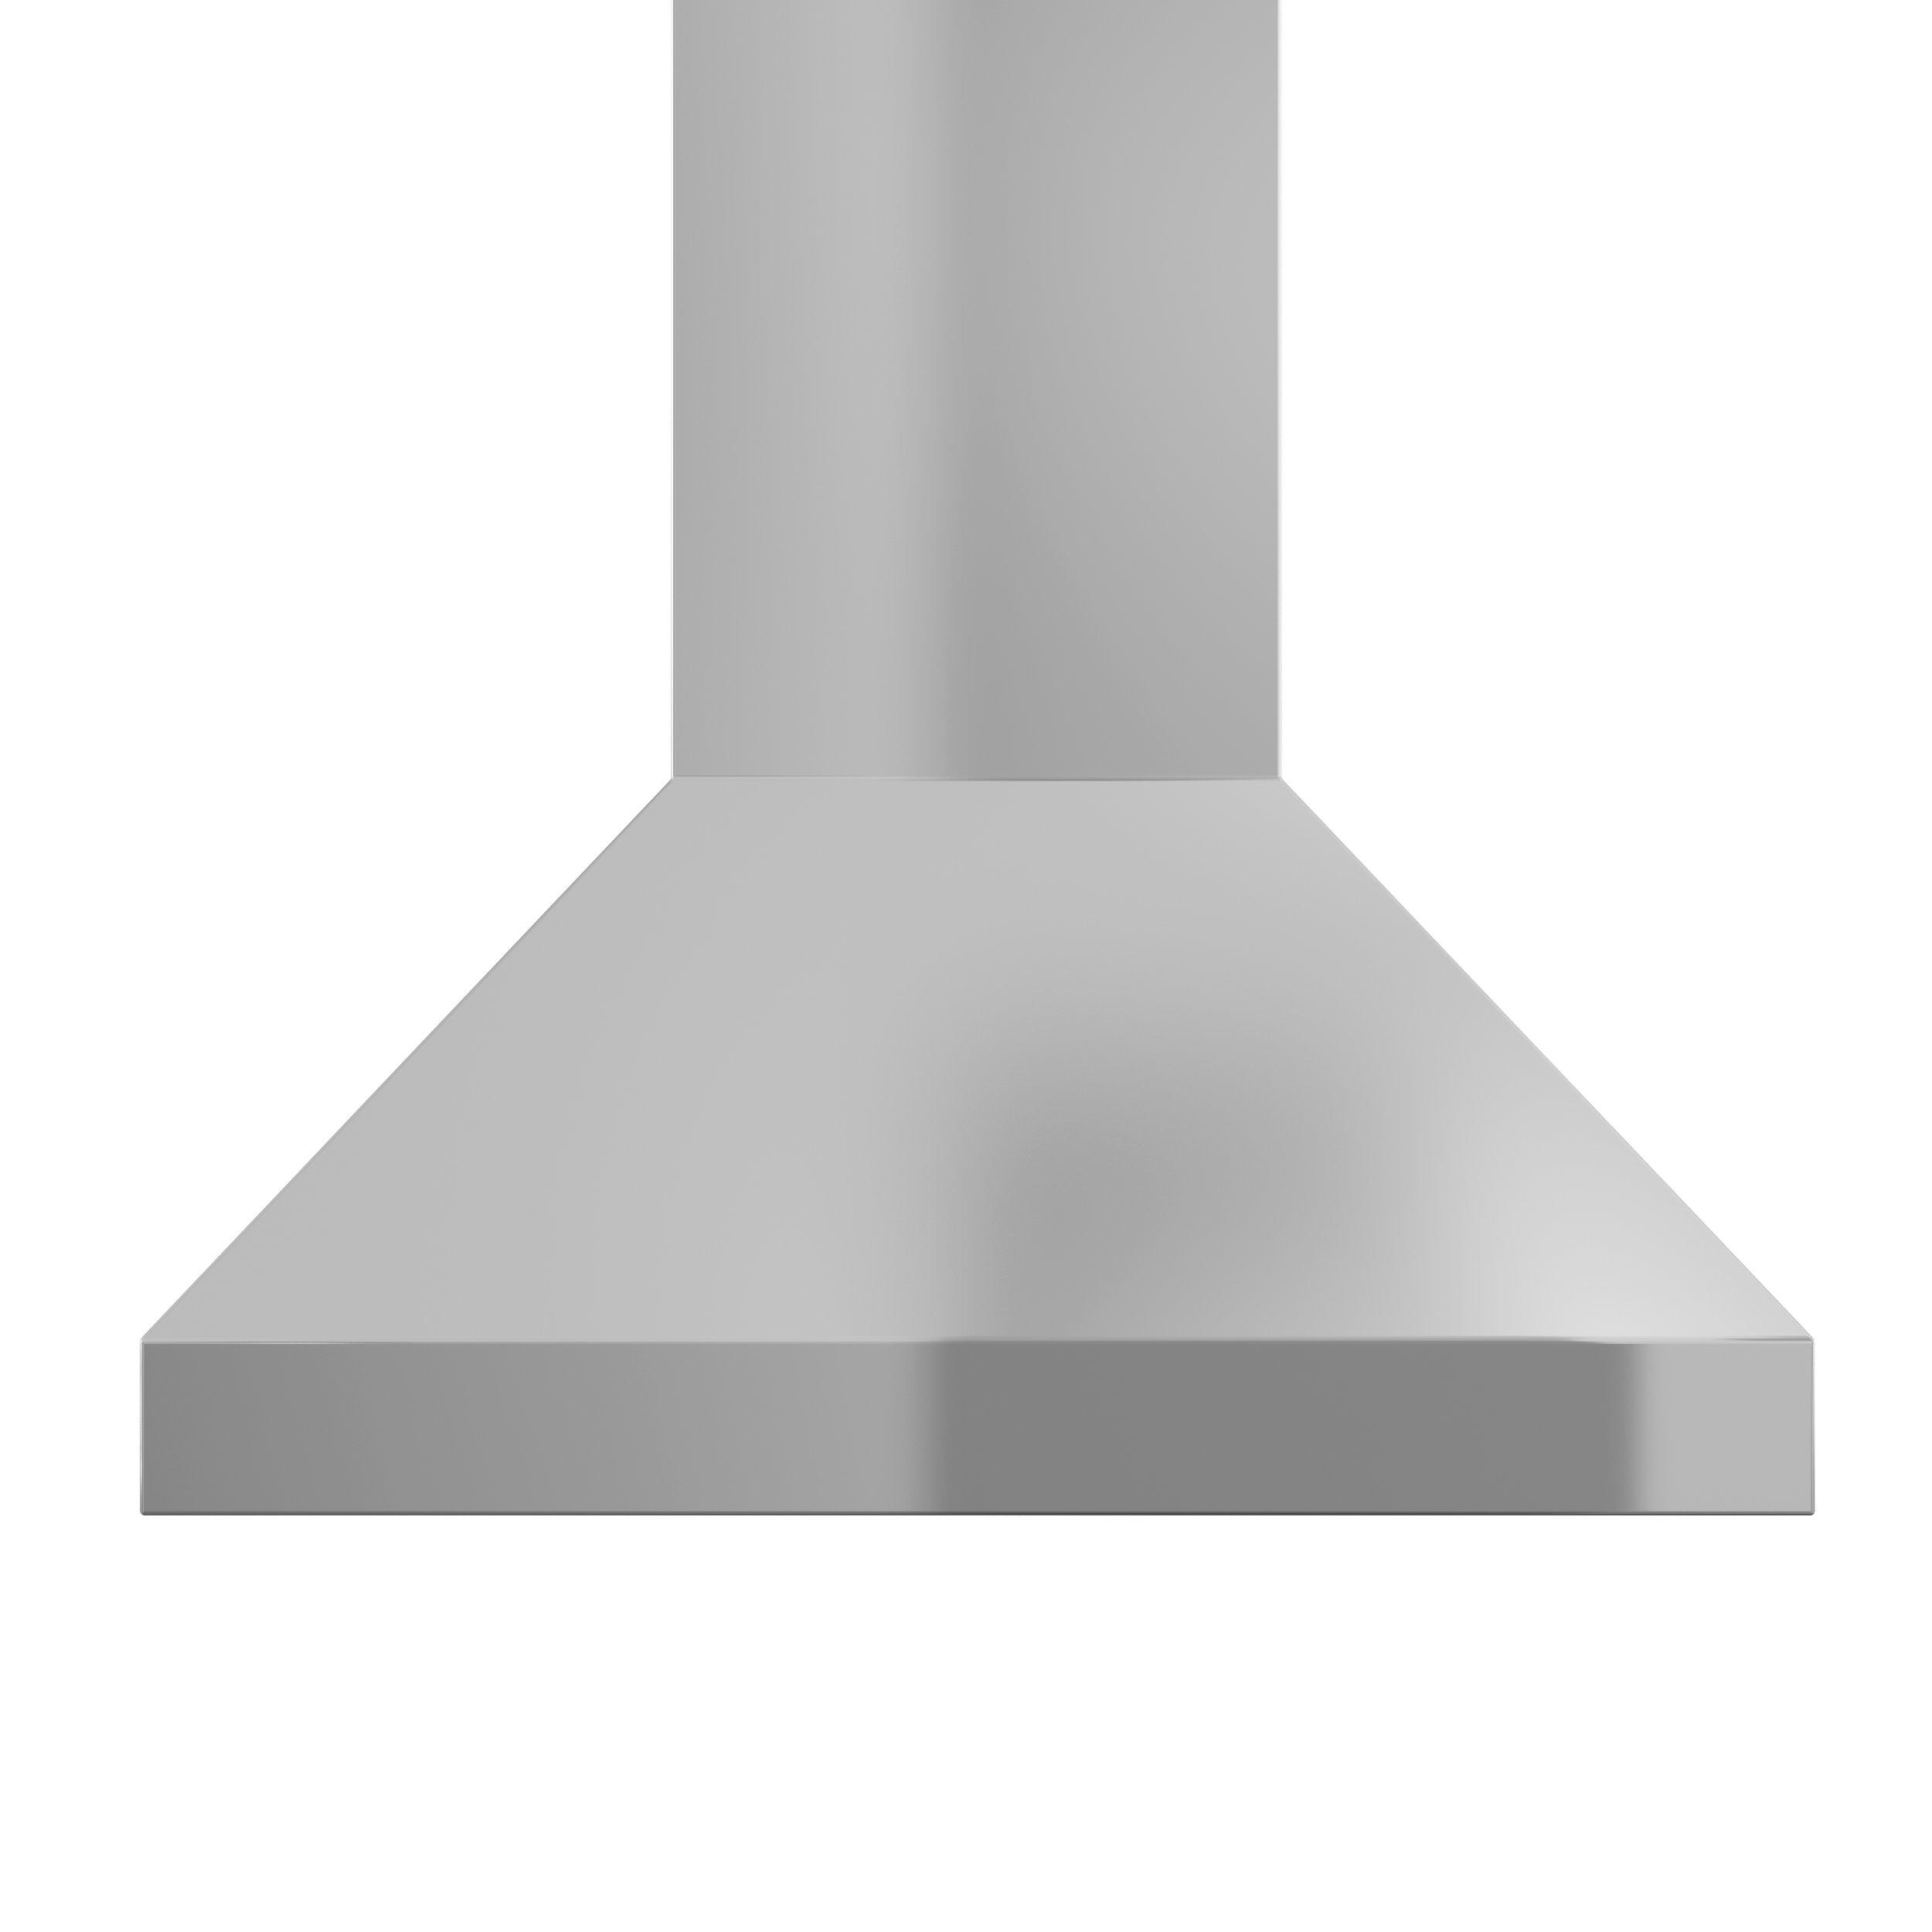 zline-stainless-steel-wall-mounted-range-hood-597-front.jpg